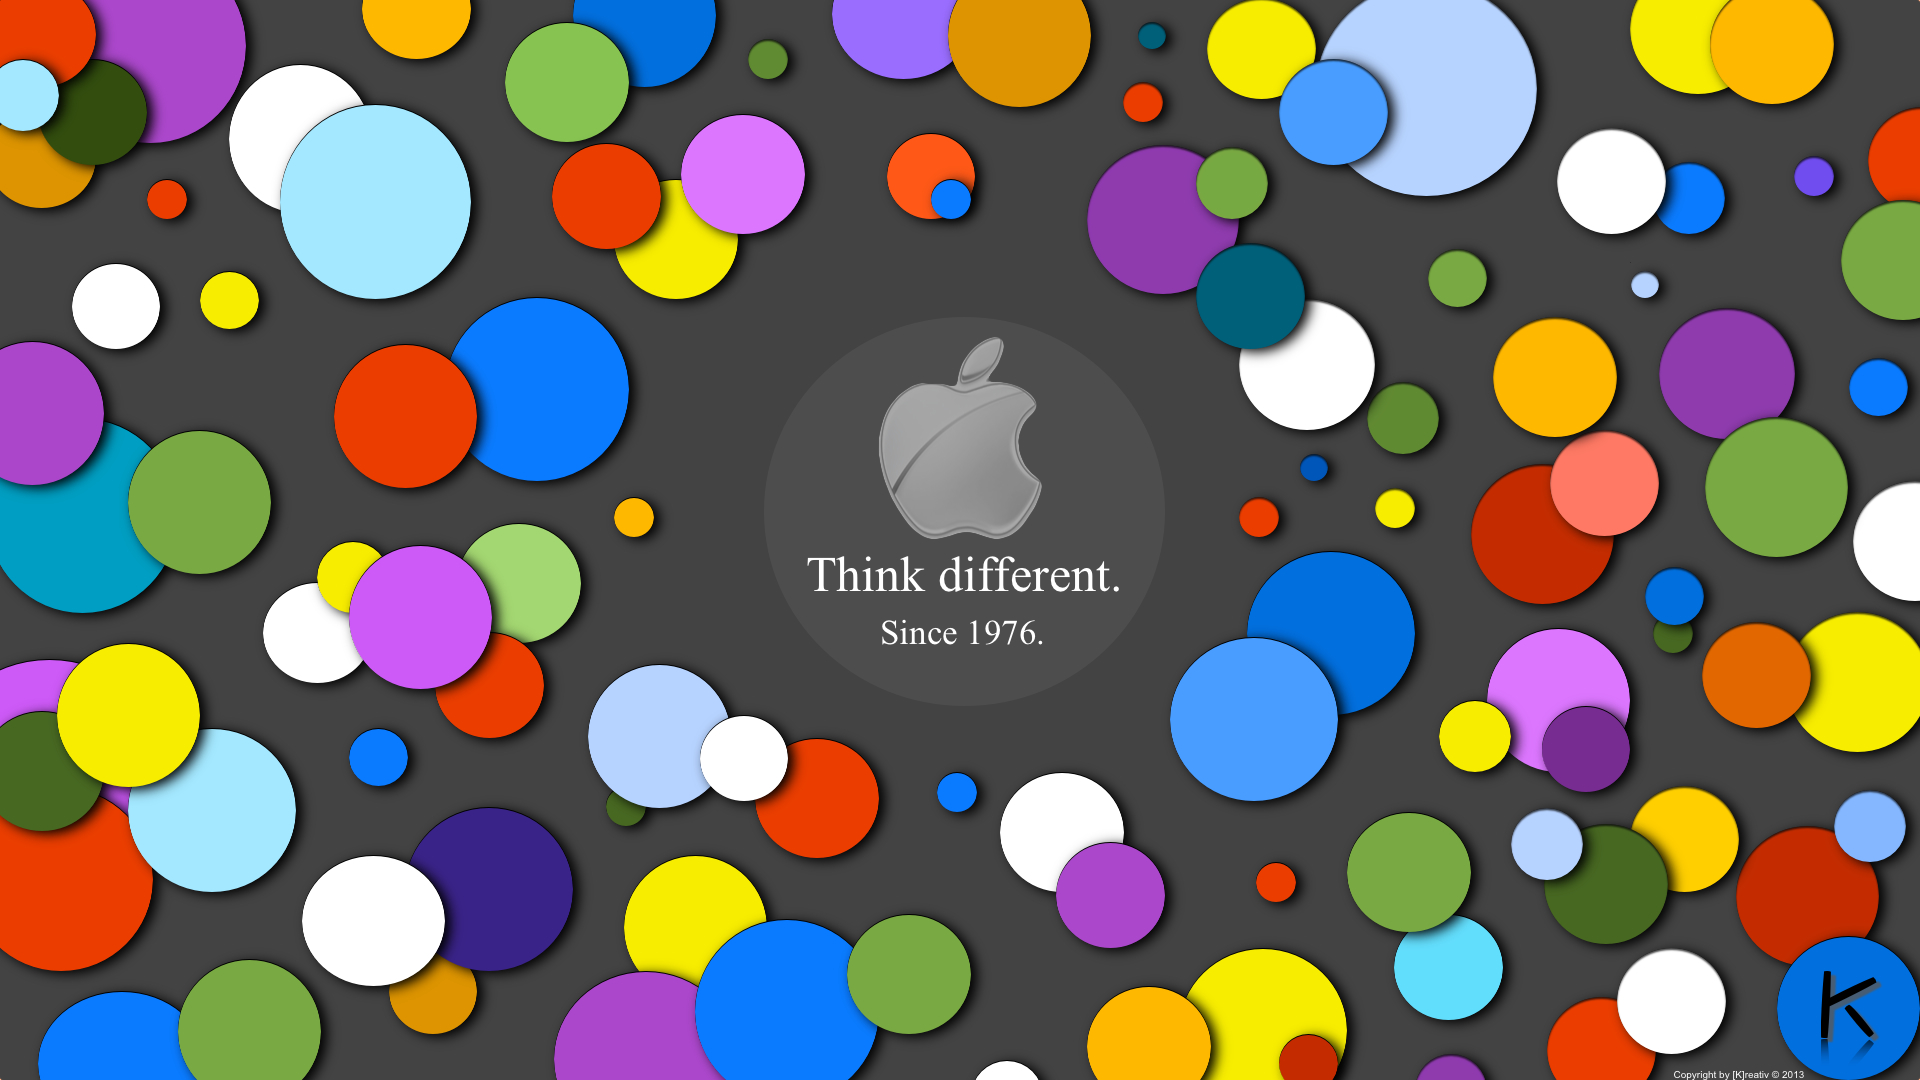 think different wallpaper wallpapersafari